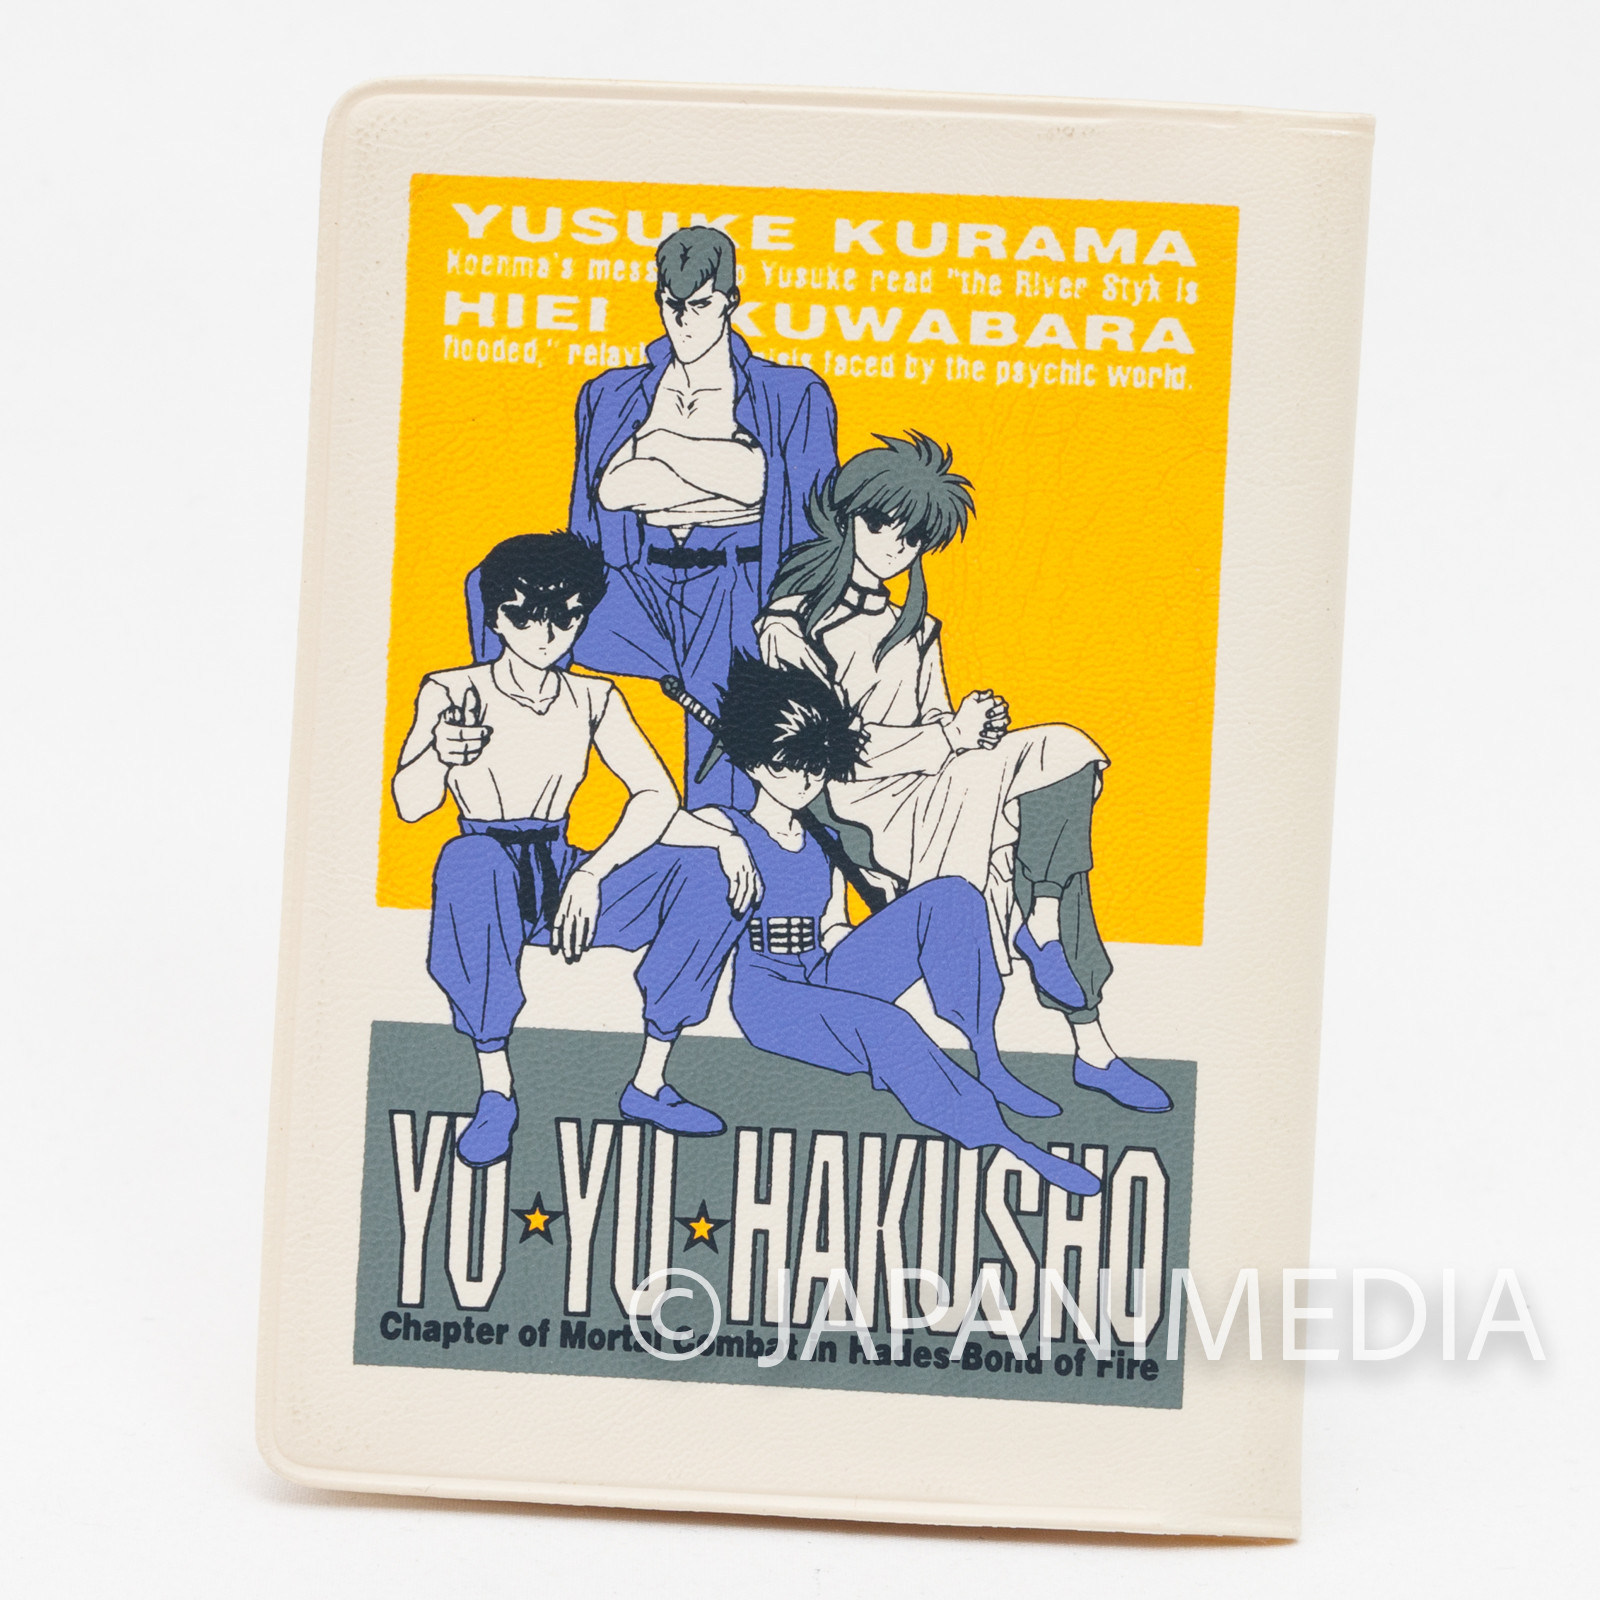 Yu-Yu Hakusho Yusuke Kuwabara Hiei Kurama Pass Card Case Holder 6